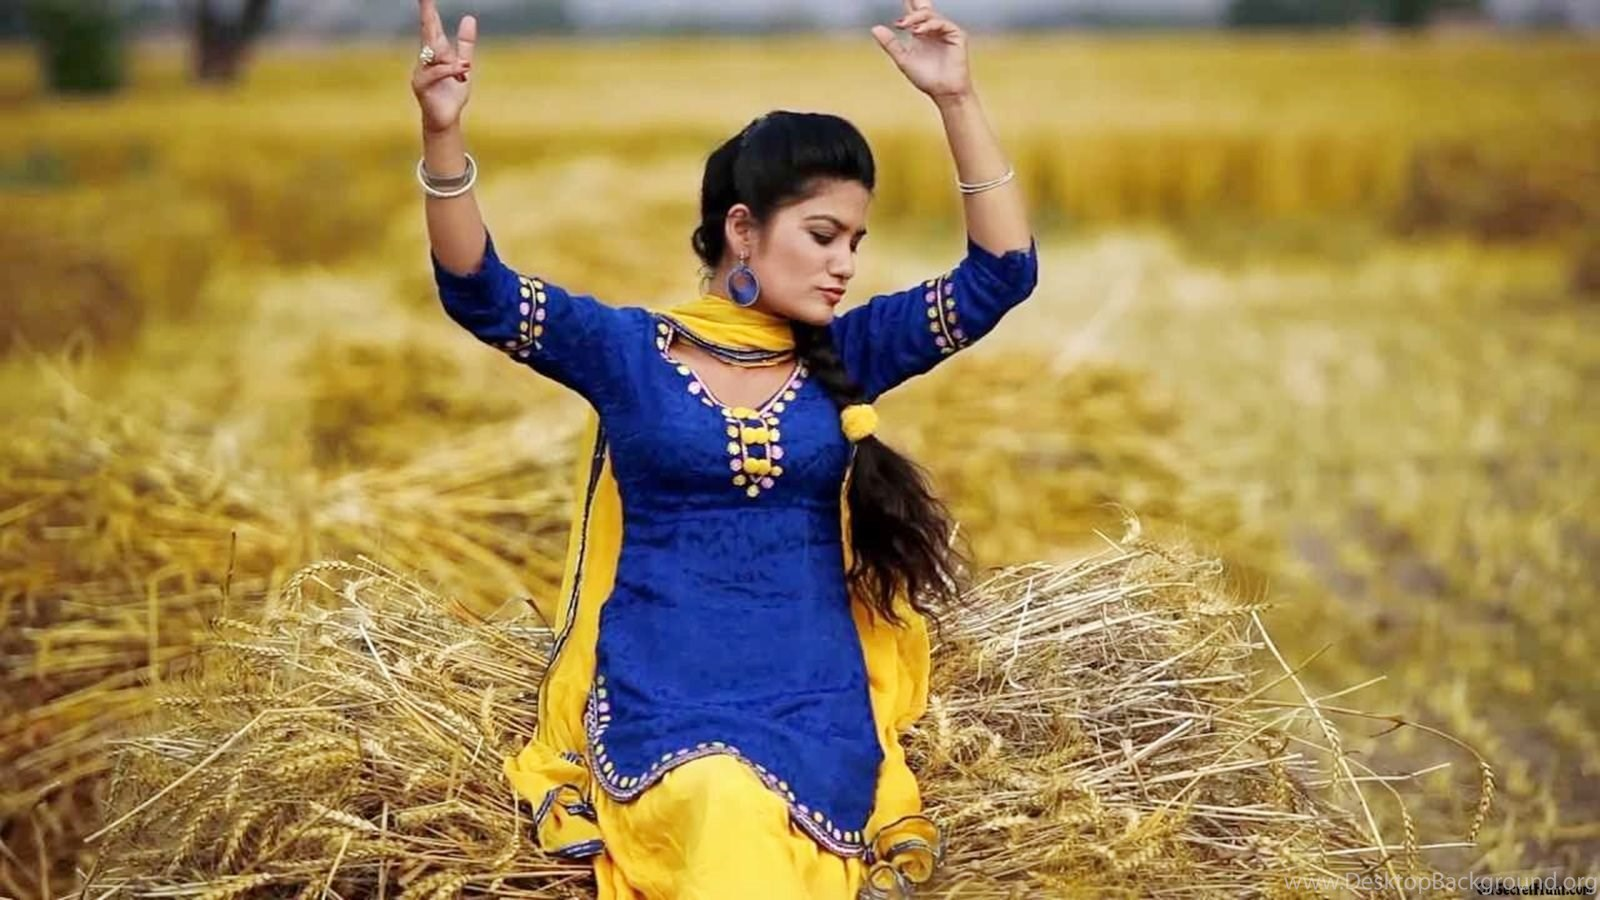 beautiful punjabi girls wallpapers and pictures desktop background